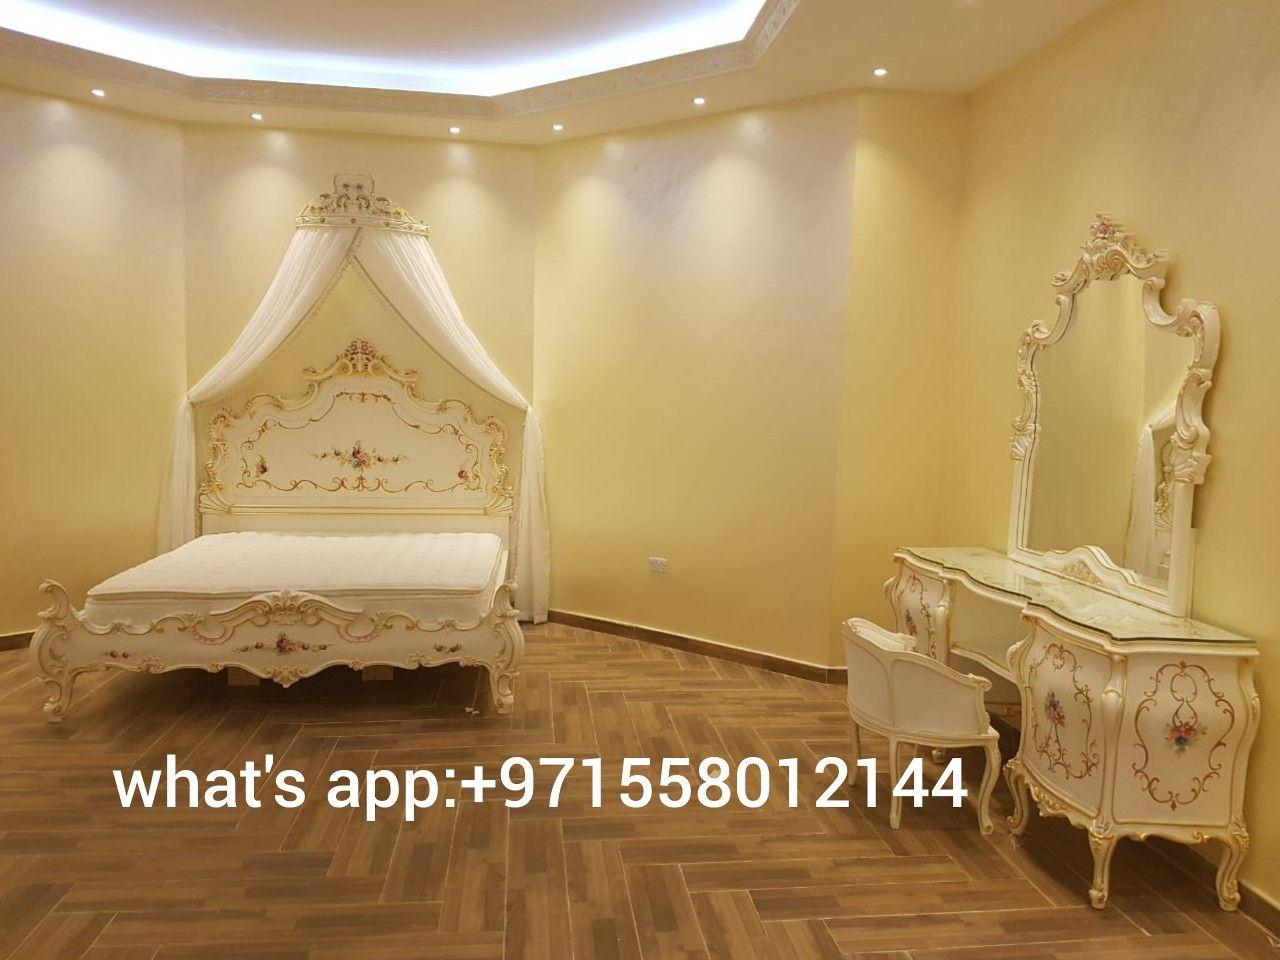 Pin By Knooz Dumyat Furniture On غرف نوم مصرية روعة من كنوز دمياط للمفروشات فى مصر والامارات